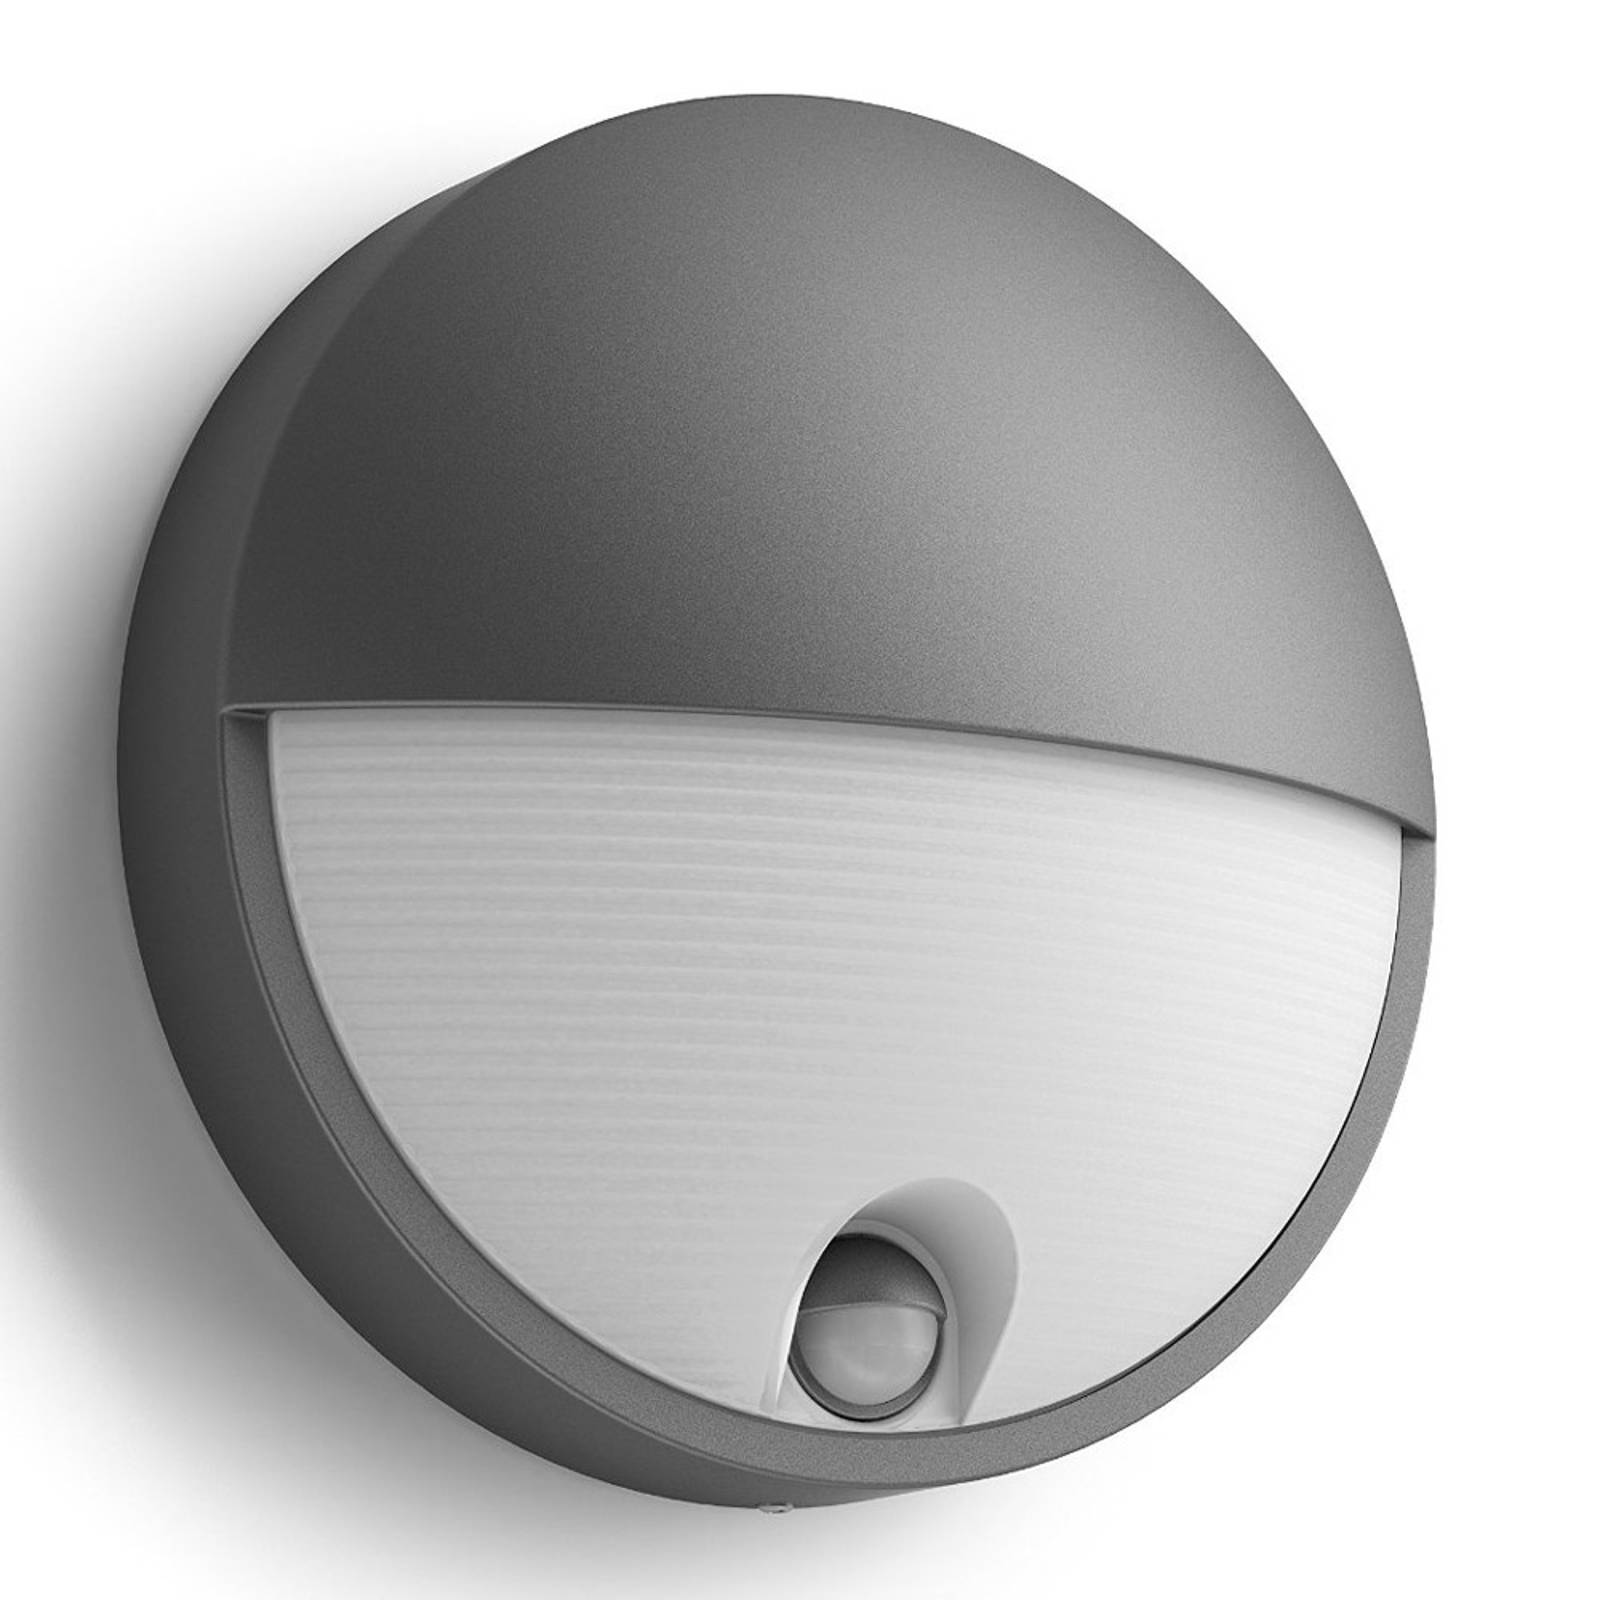 Capricorn - LED outdoor wandlamp m bewegingsmelder